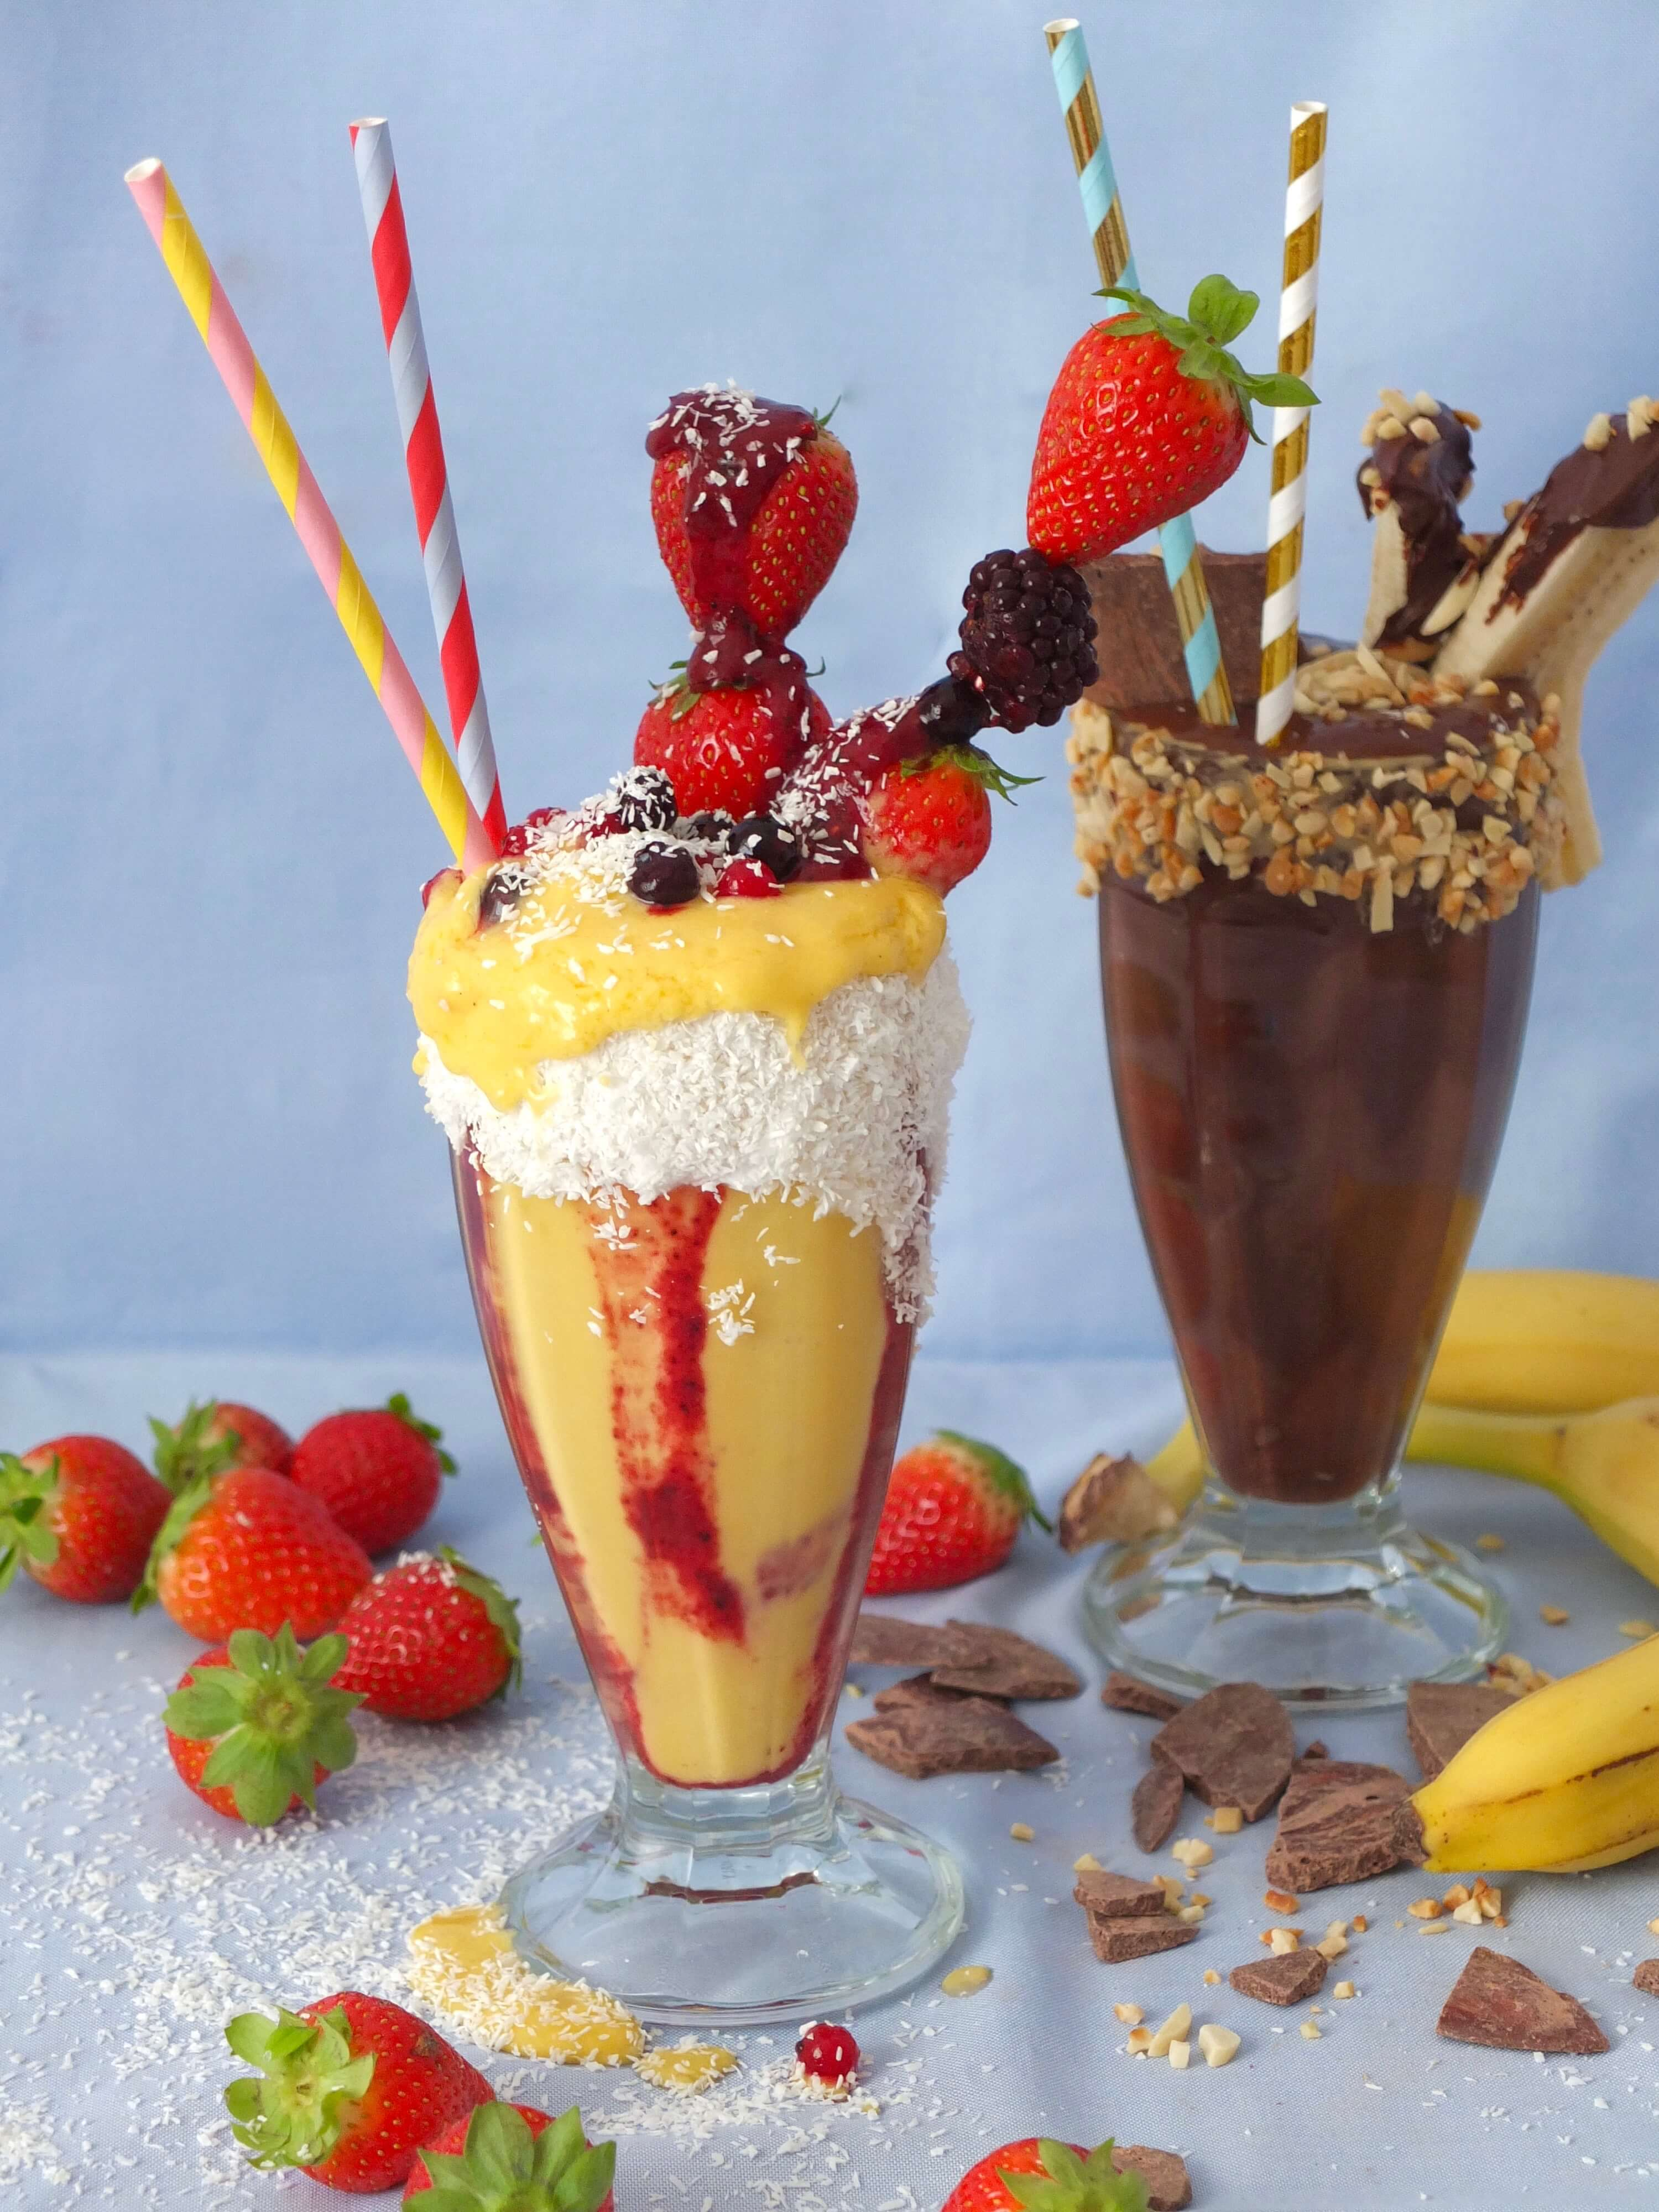 Gesunde Freakshakes | Vegane Milkshakes ohne Zucker | La Crema Patisserie Food- und Backblog